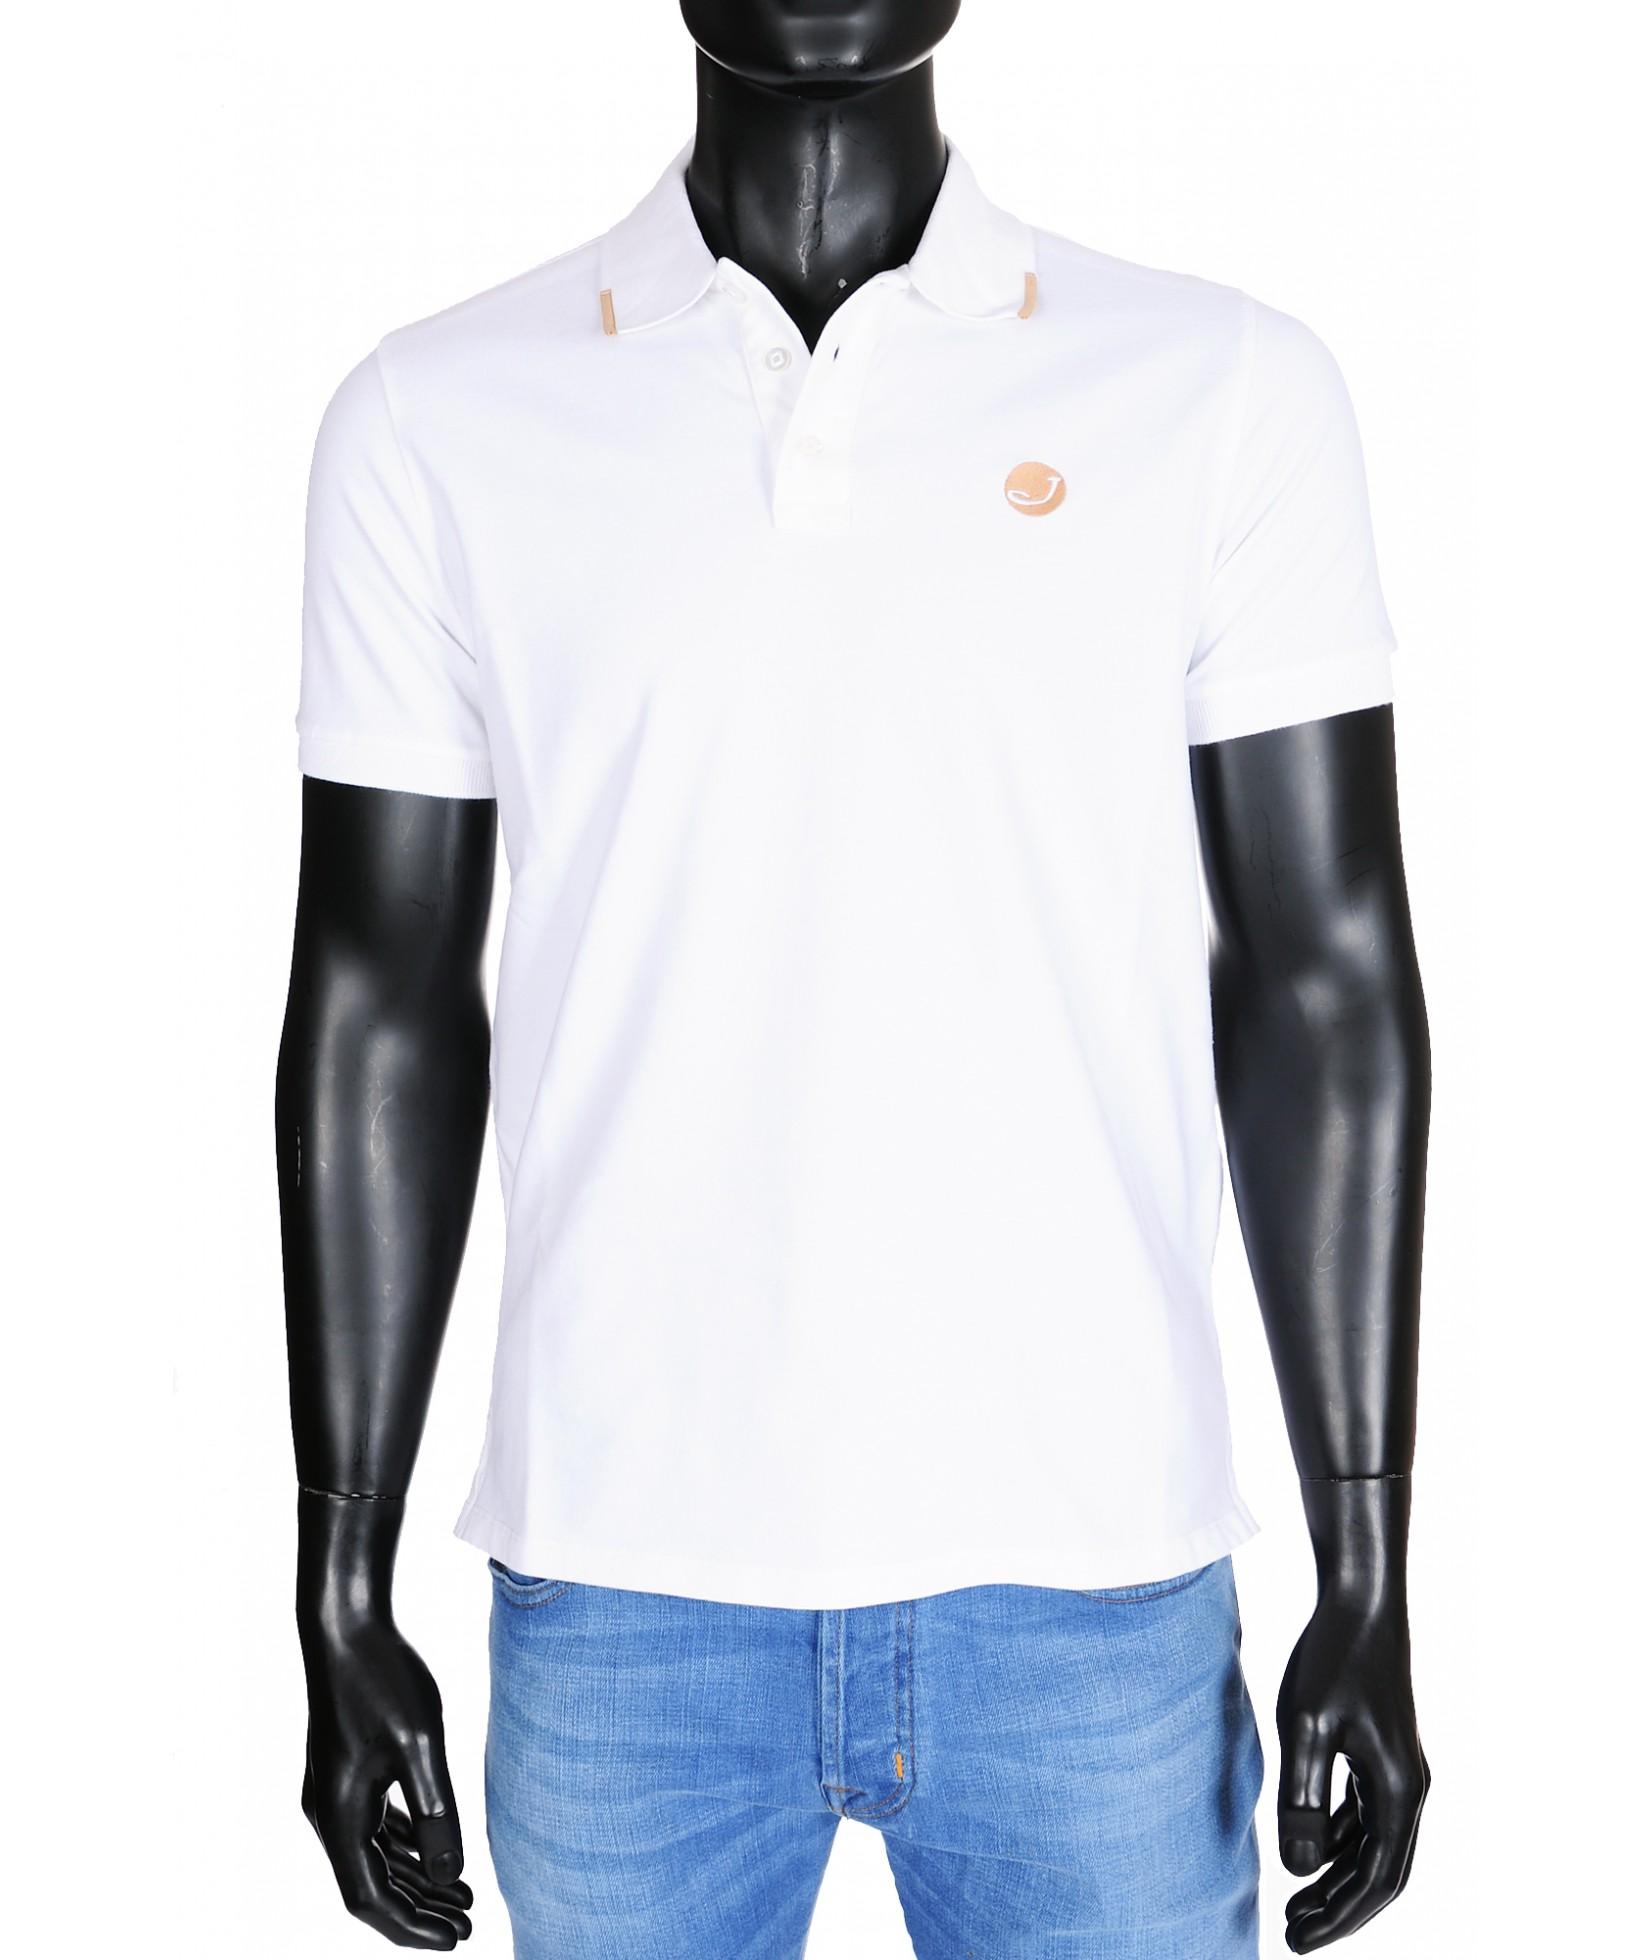 Jacob Cohen Poloshirt 4038 Weiß (30440)